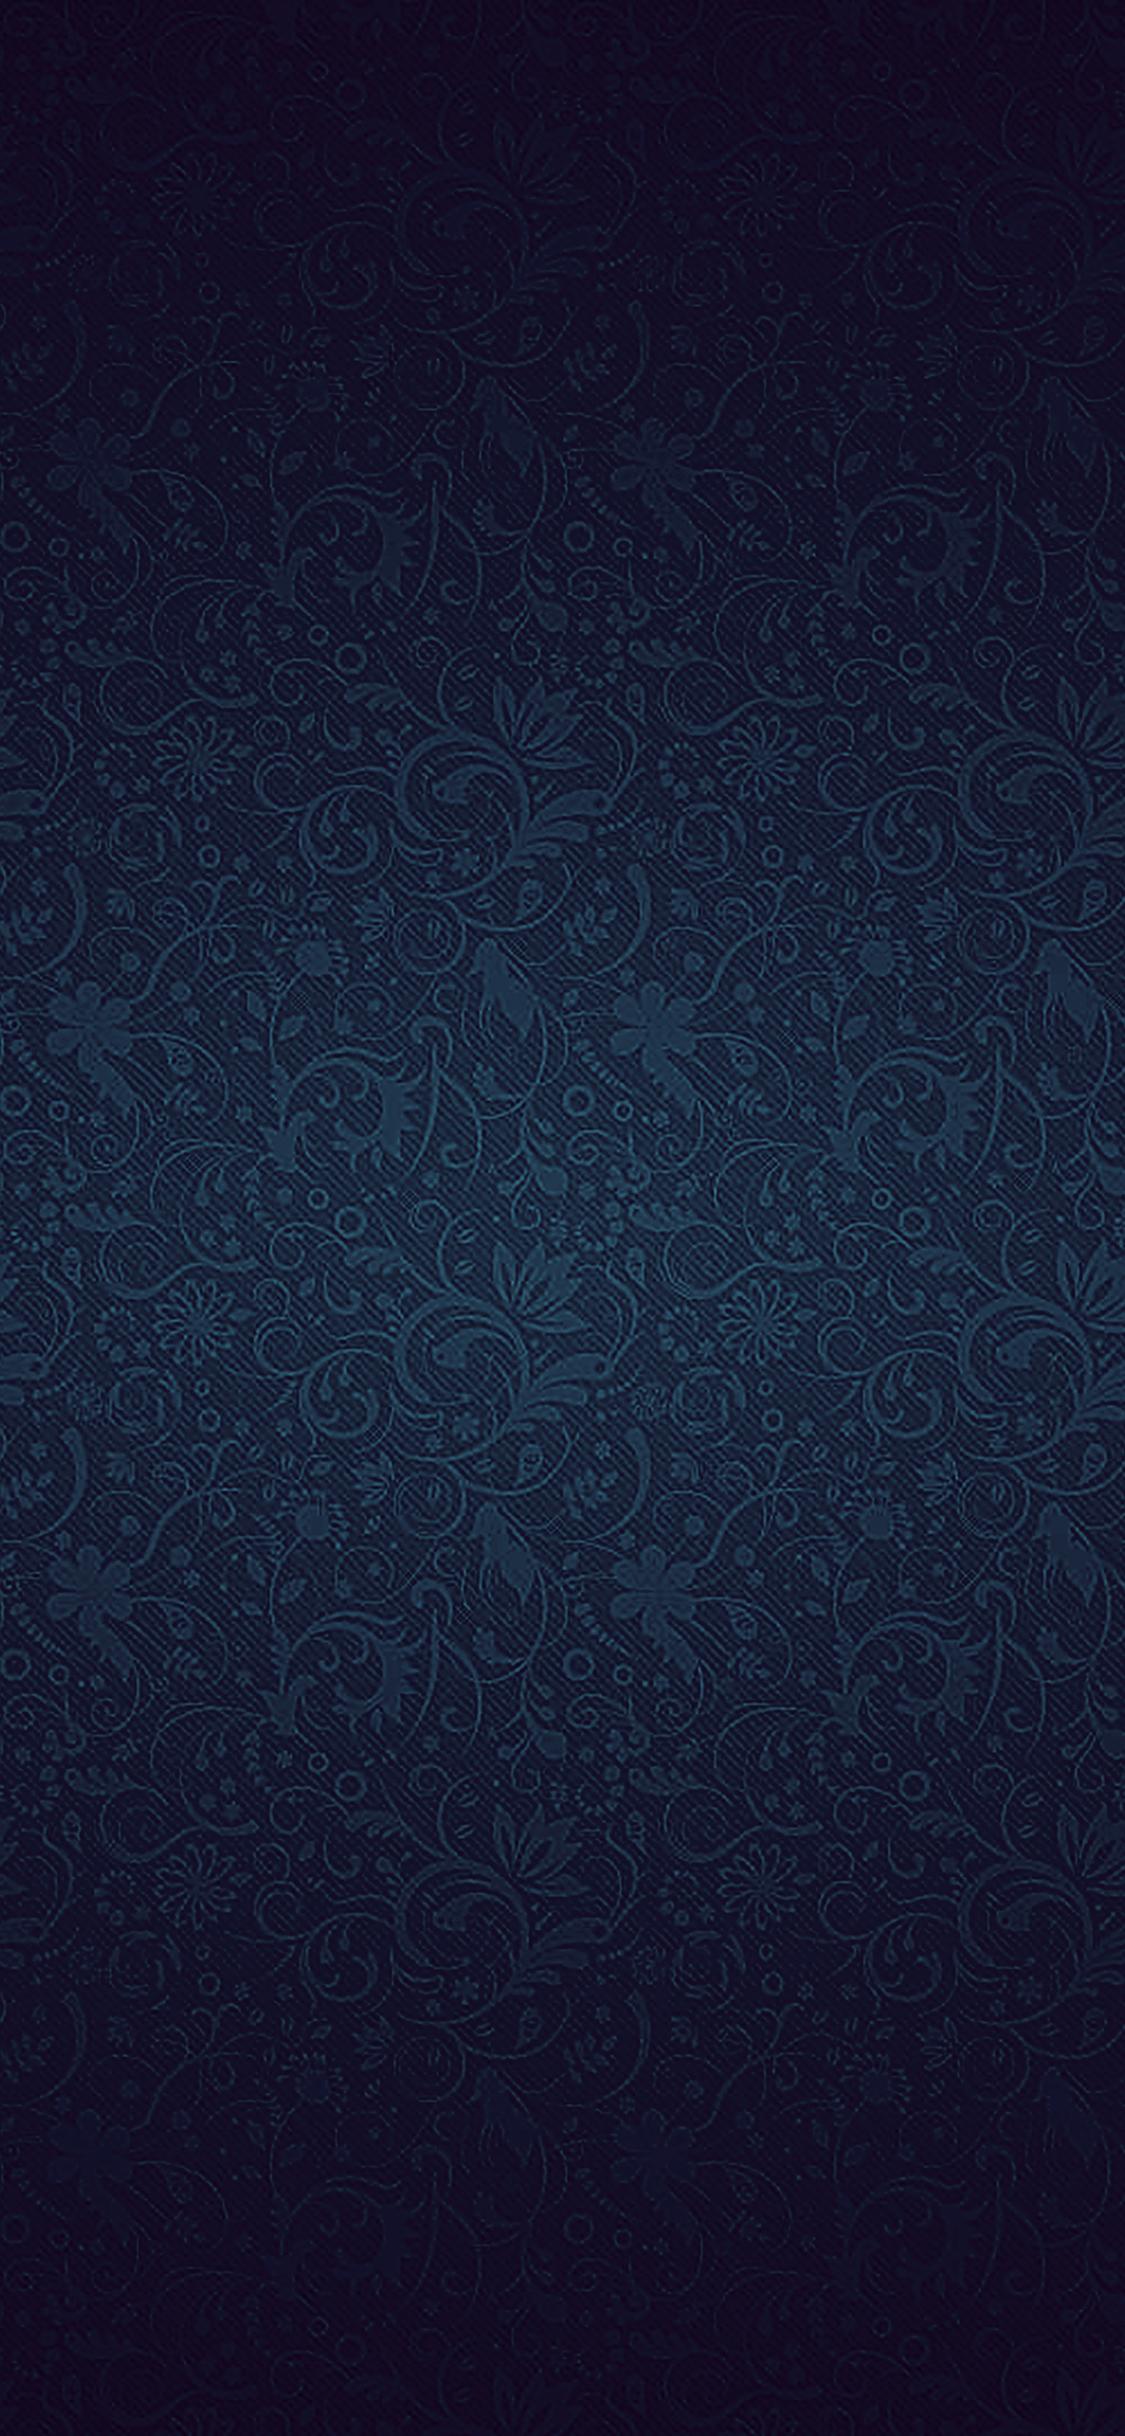 Iphonexpapers Vf81 Dark Blue Ornament Texture Pattern